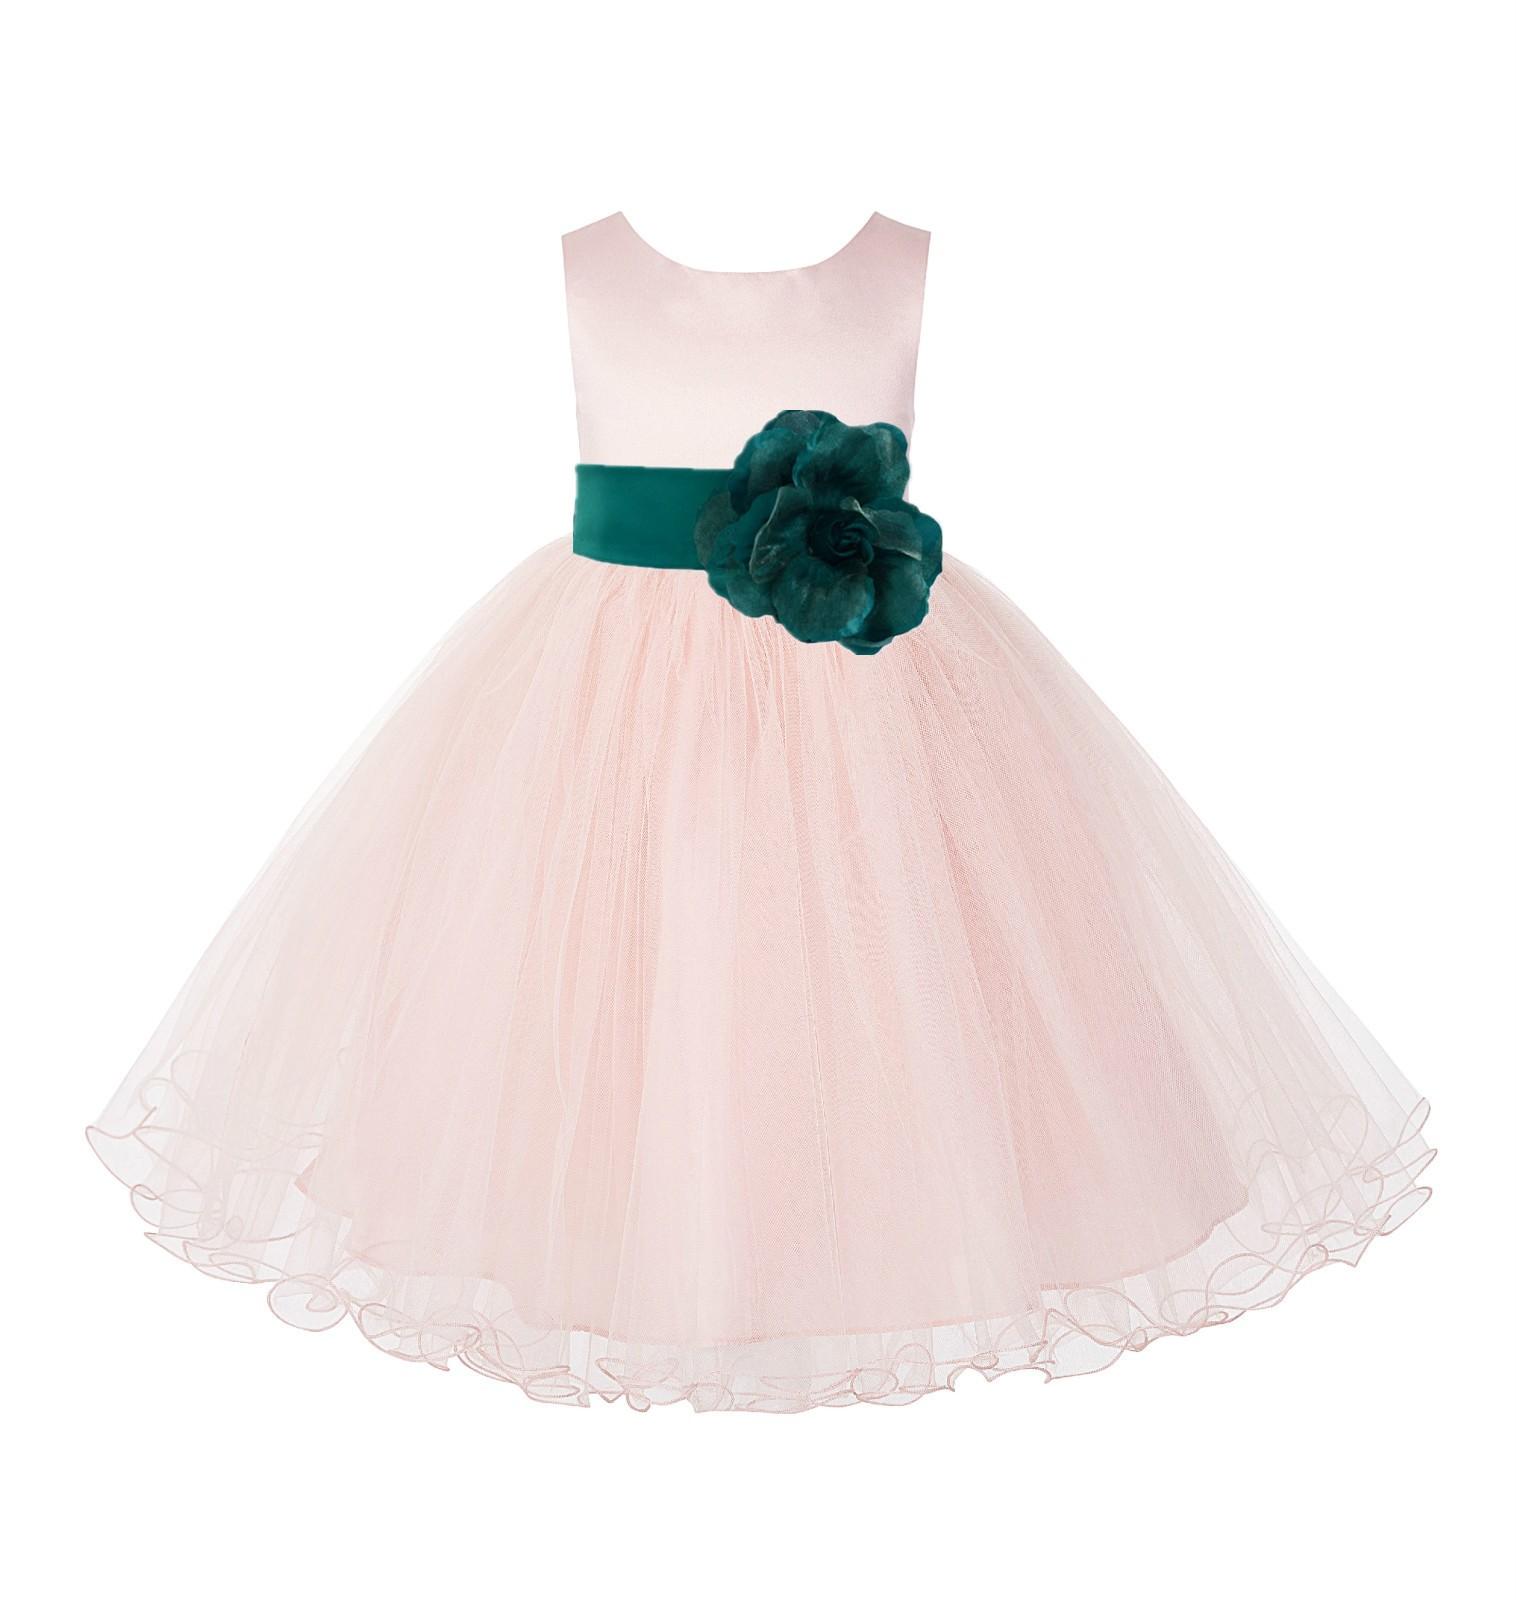 Blush PInk / Jade Tulle Rattail Edge Flower Girl Dress Wedding Bridesmaid 829T